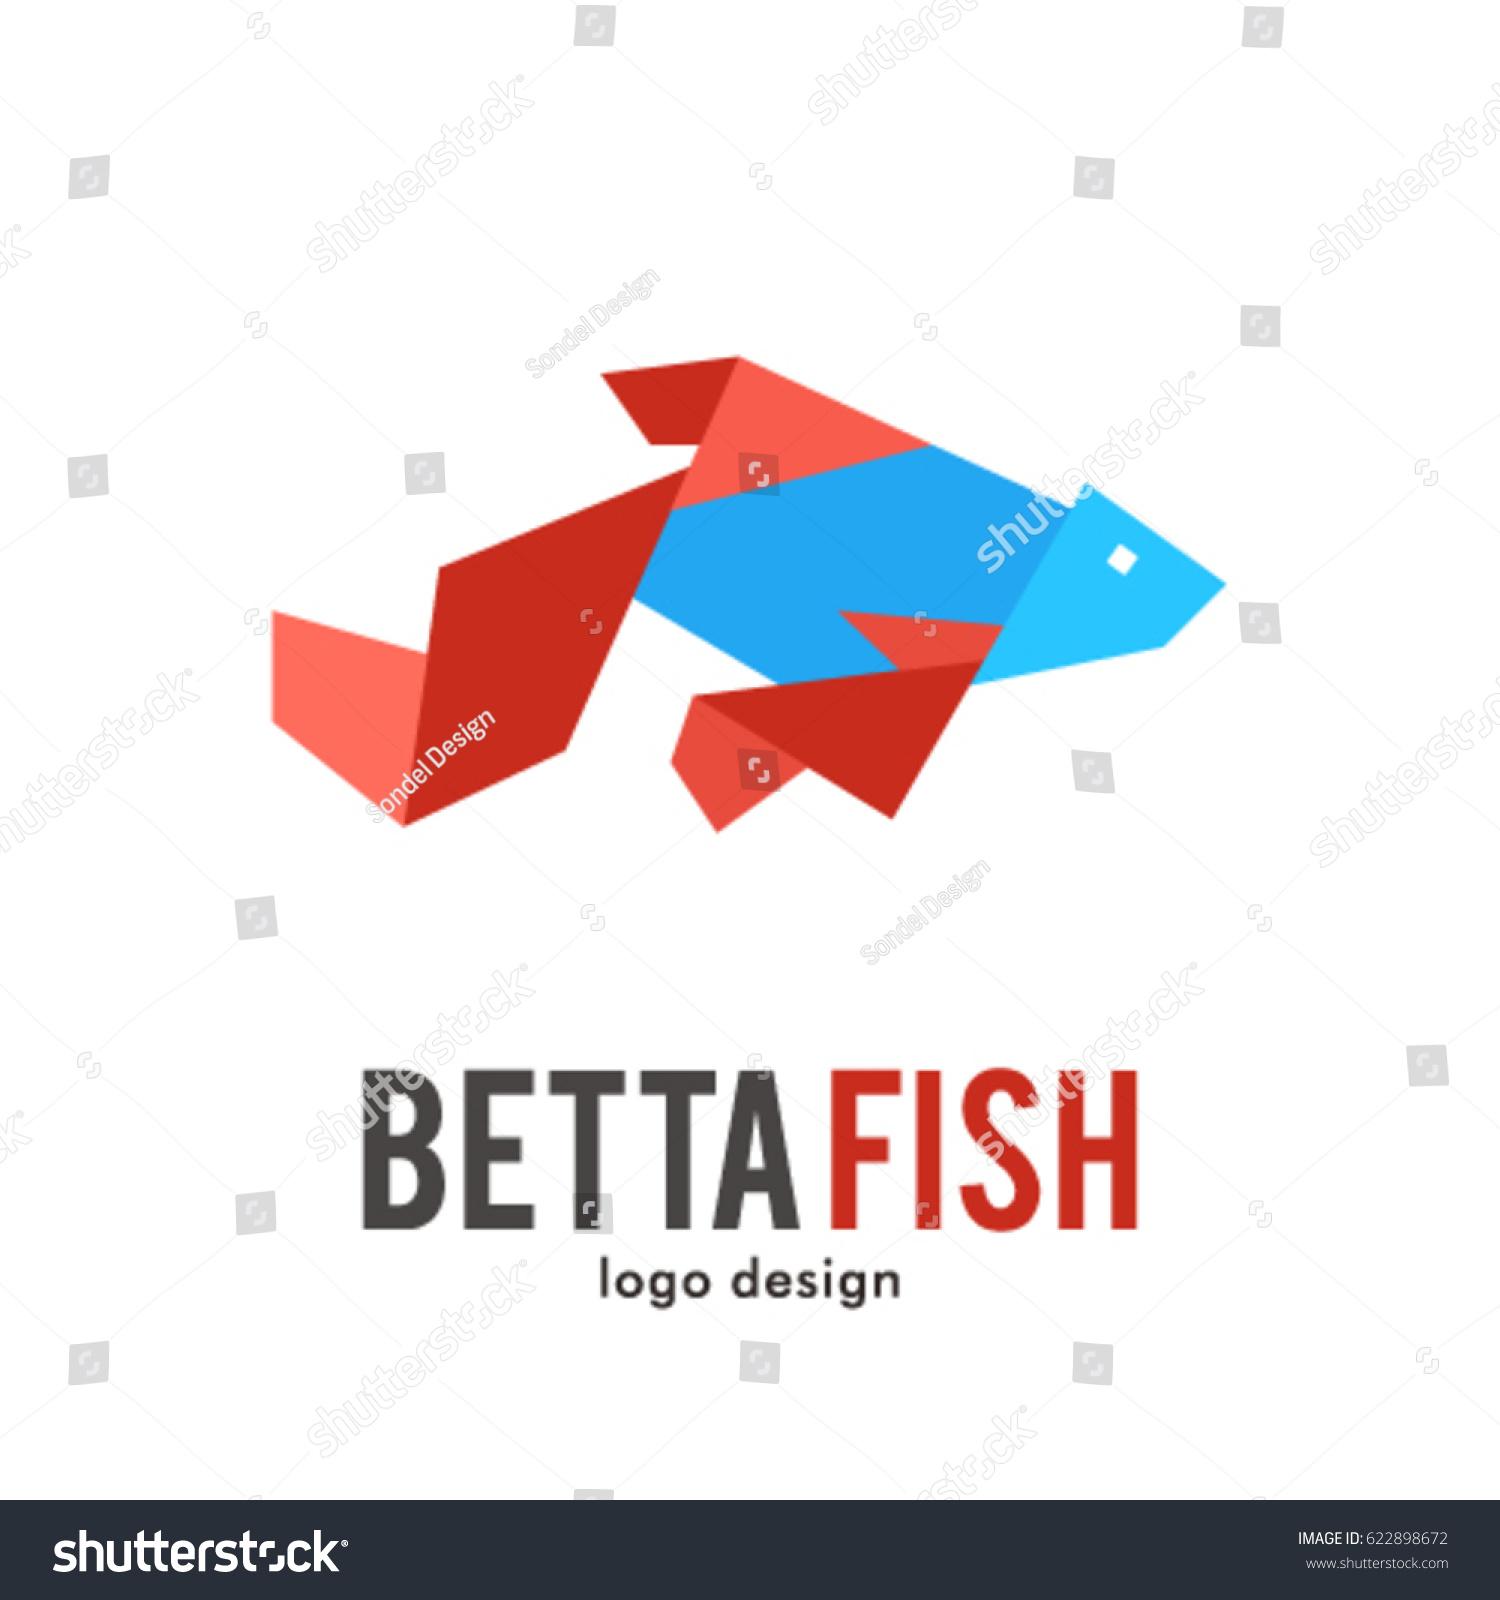 99 Betta Fish Design Pinterest Fish Logo Betta Fish And Logos